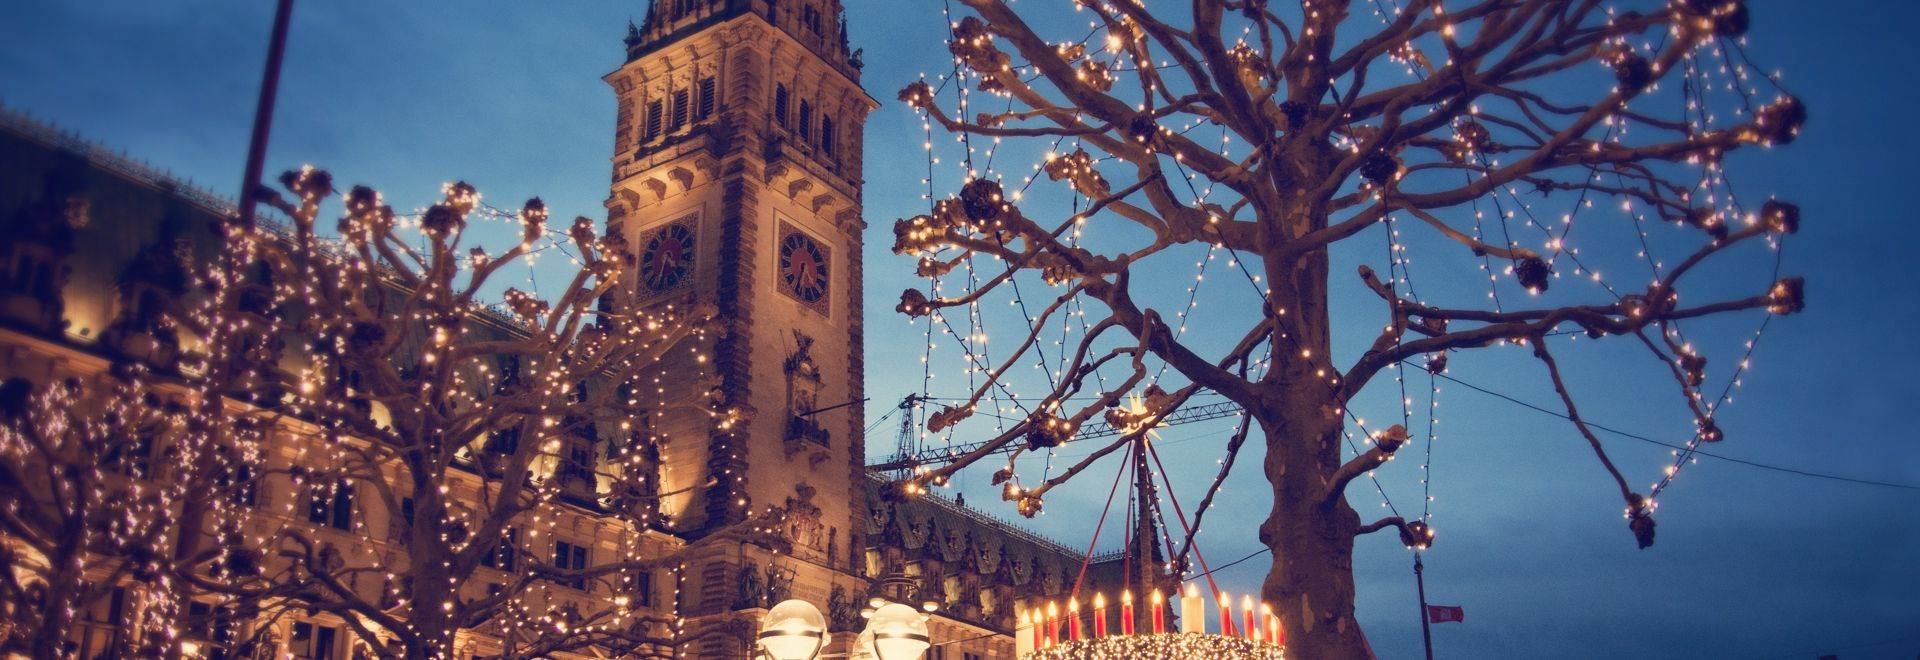 cmv amsterdam german christmas market